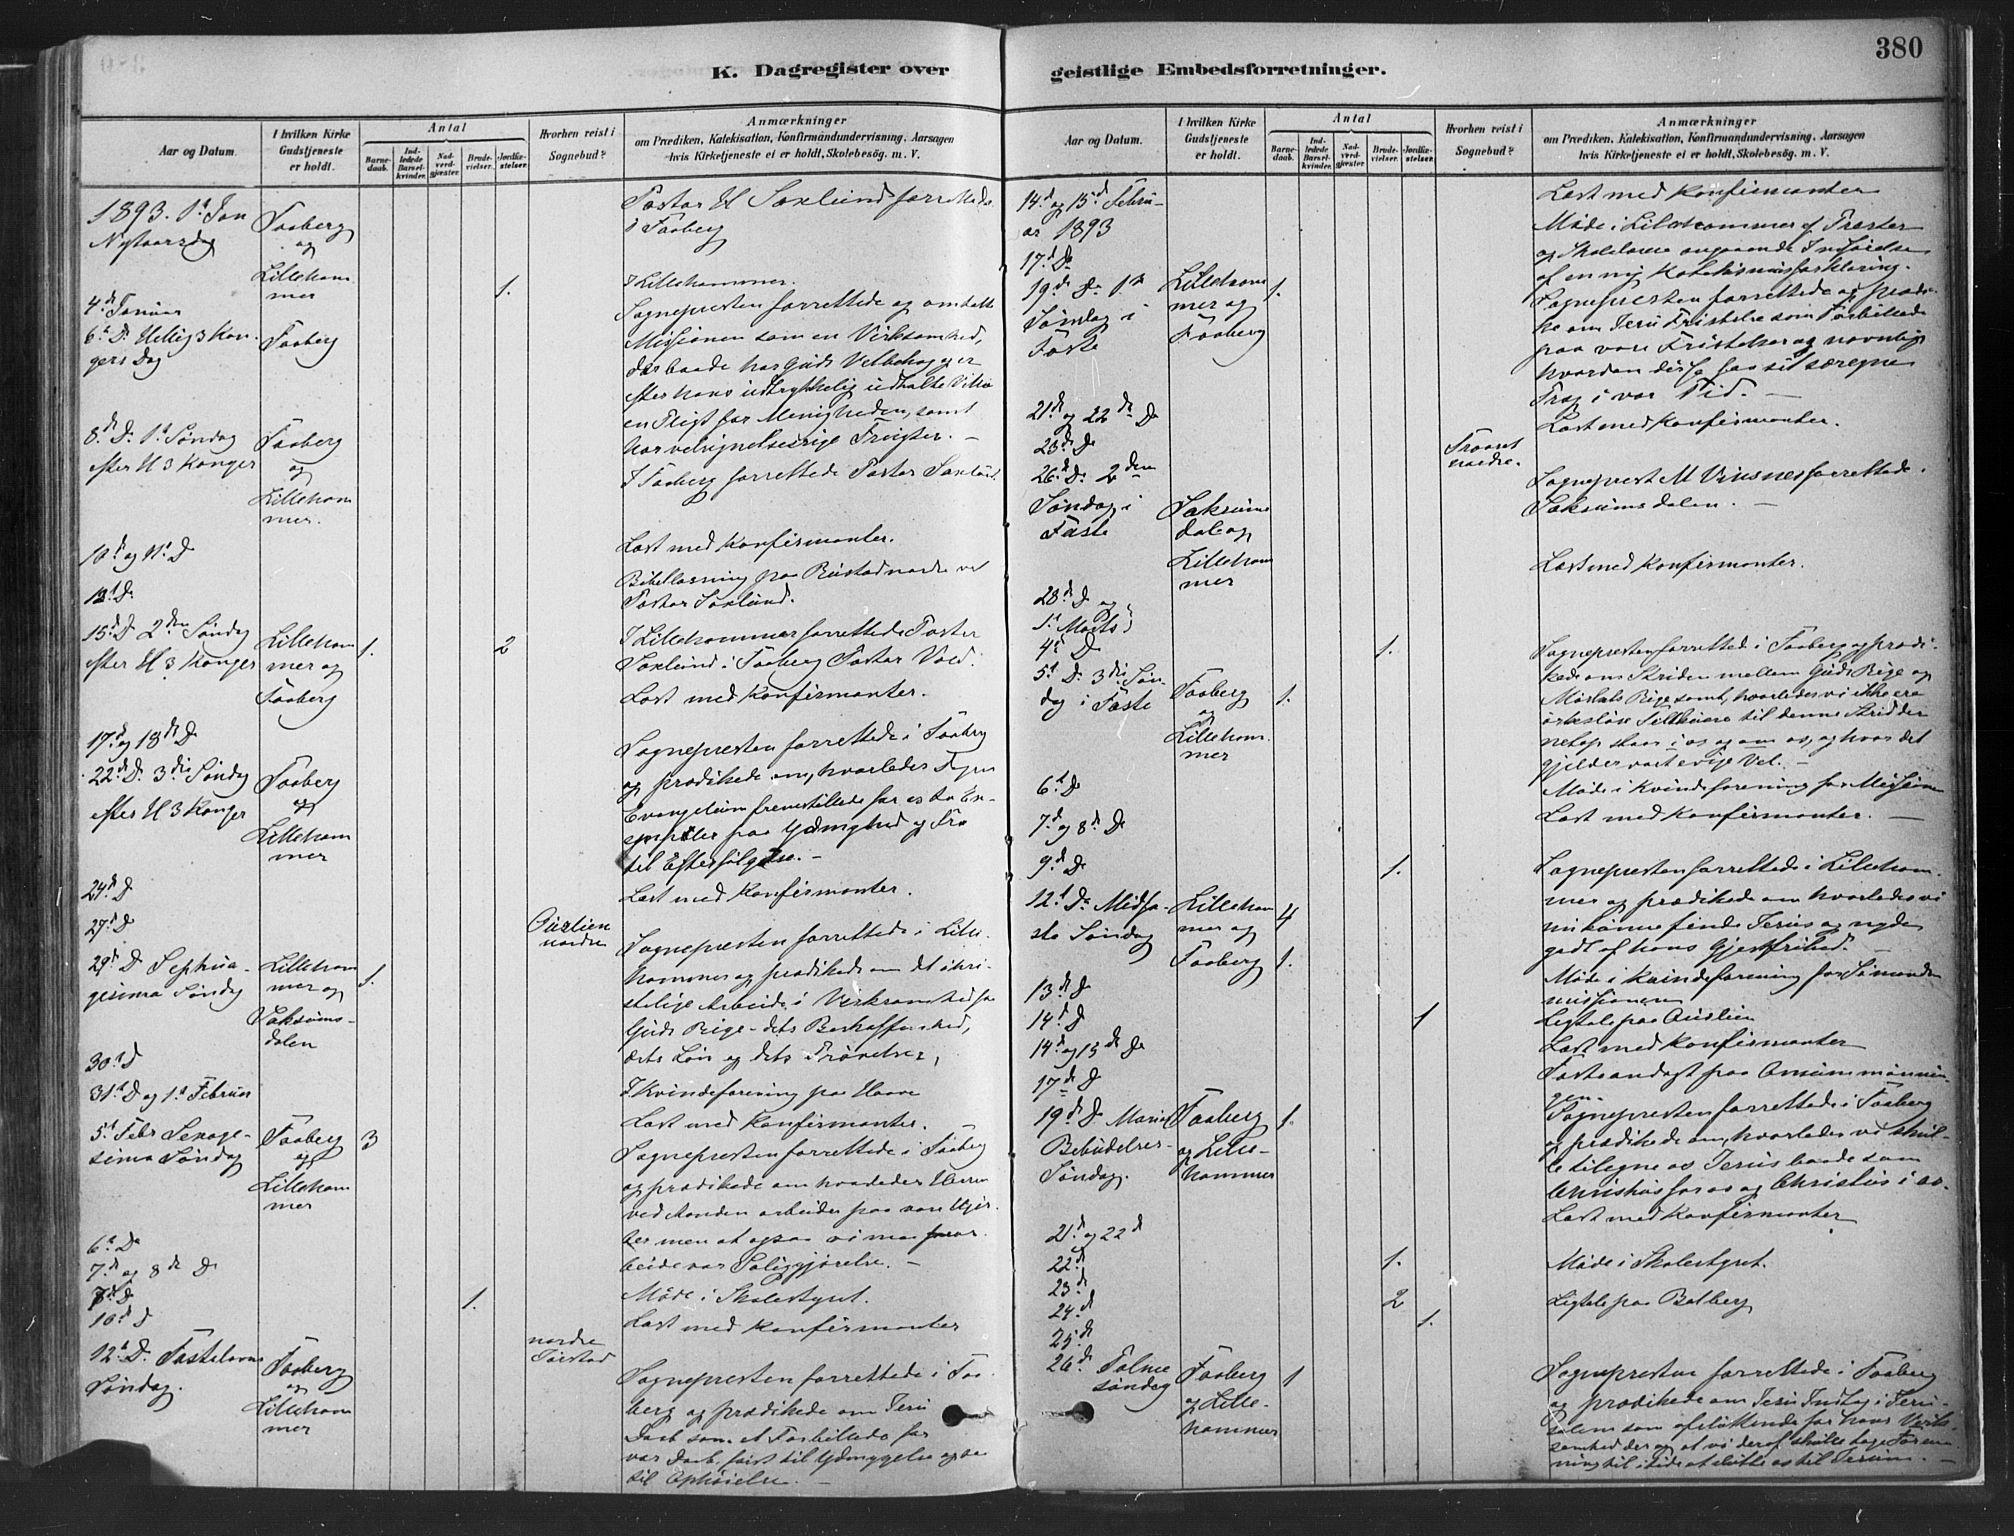 SAH, Fåberg prestekontor, Ministerialbok nr. 10, 1879-1900, s. 380